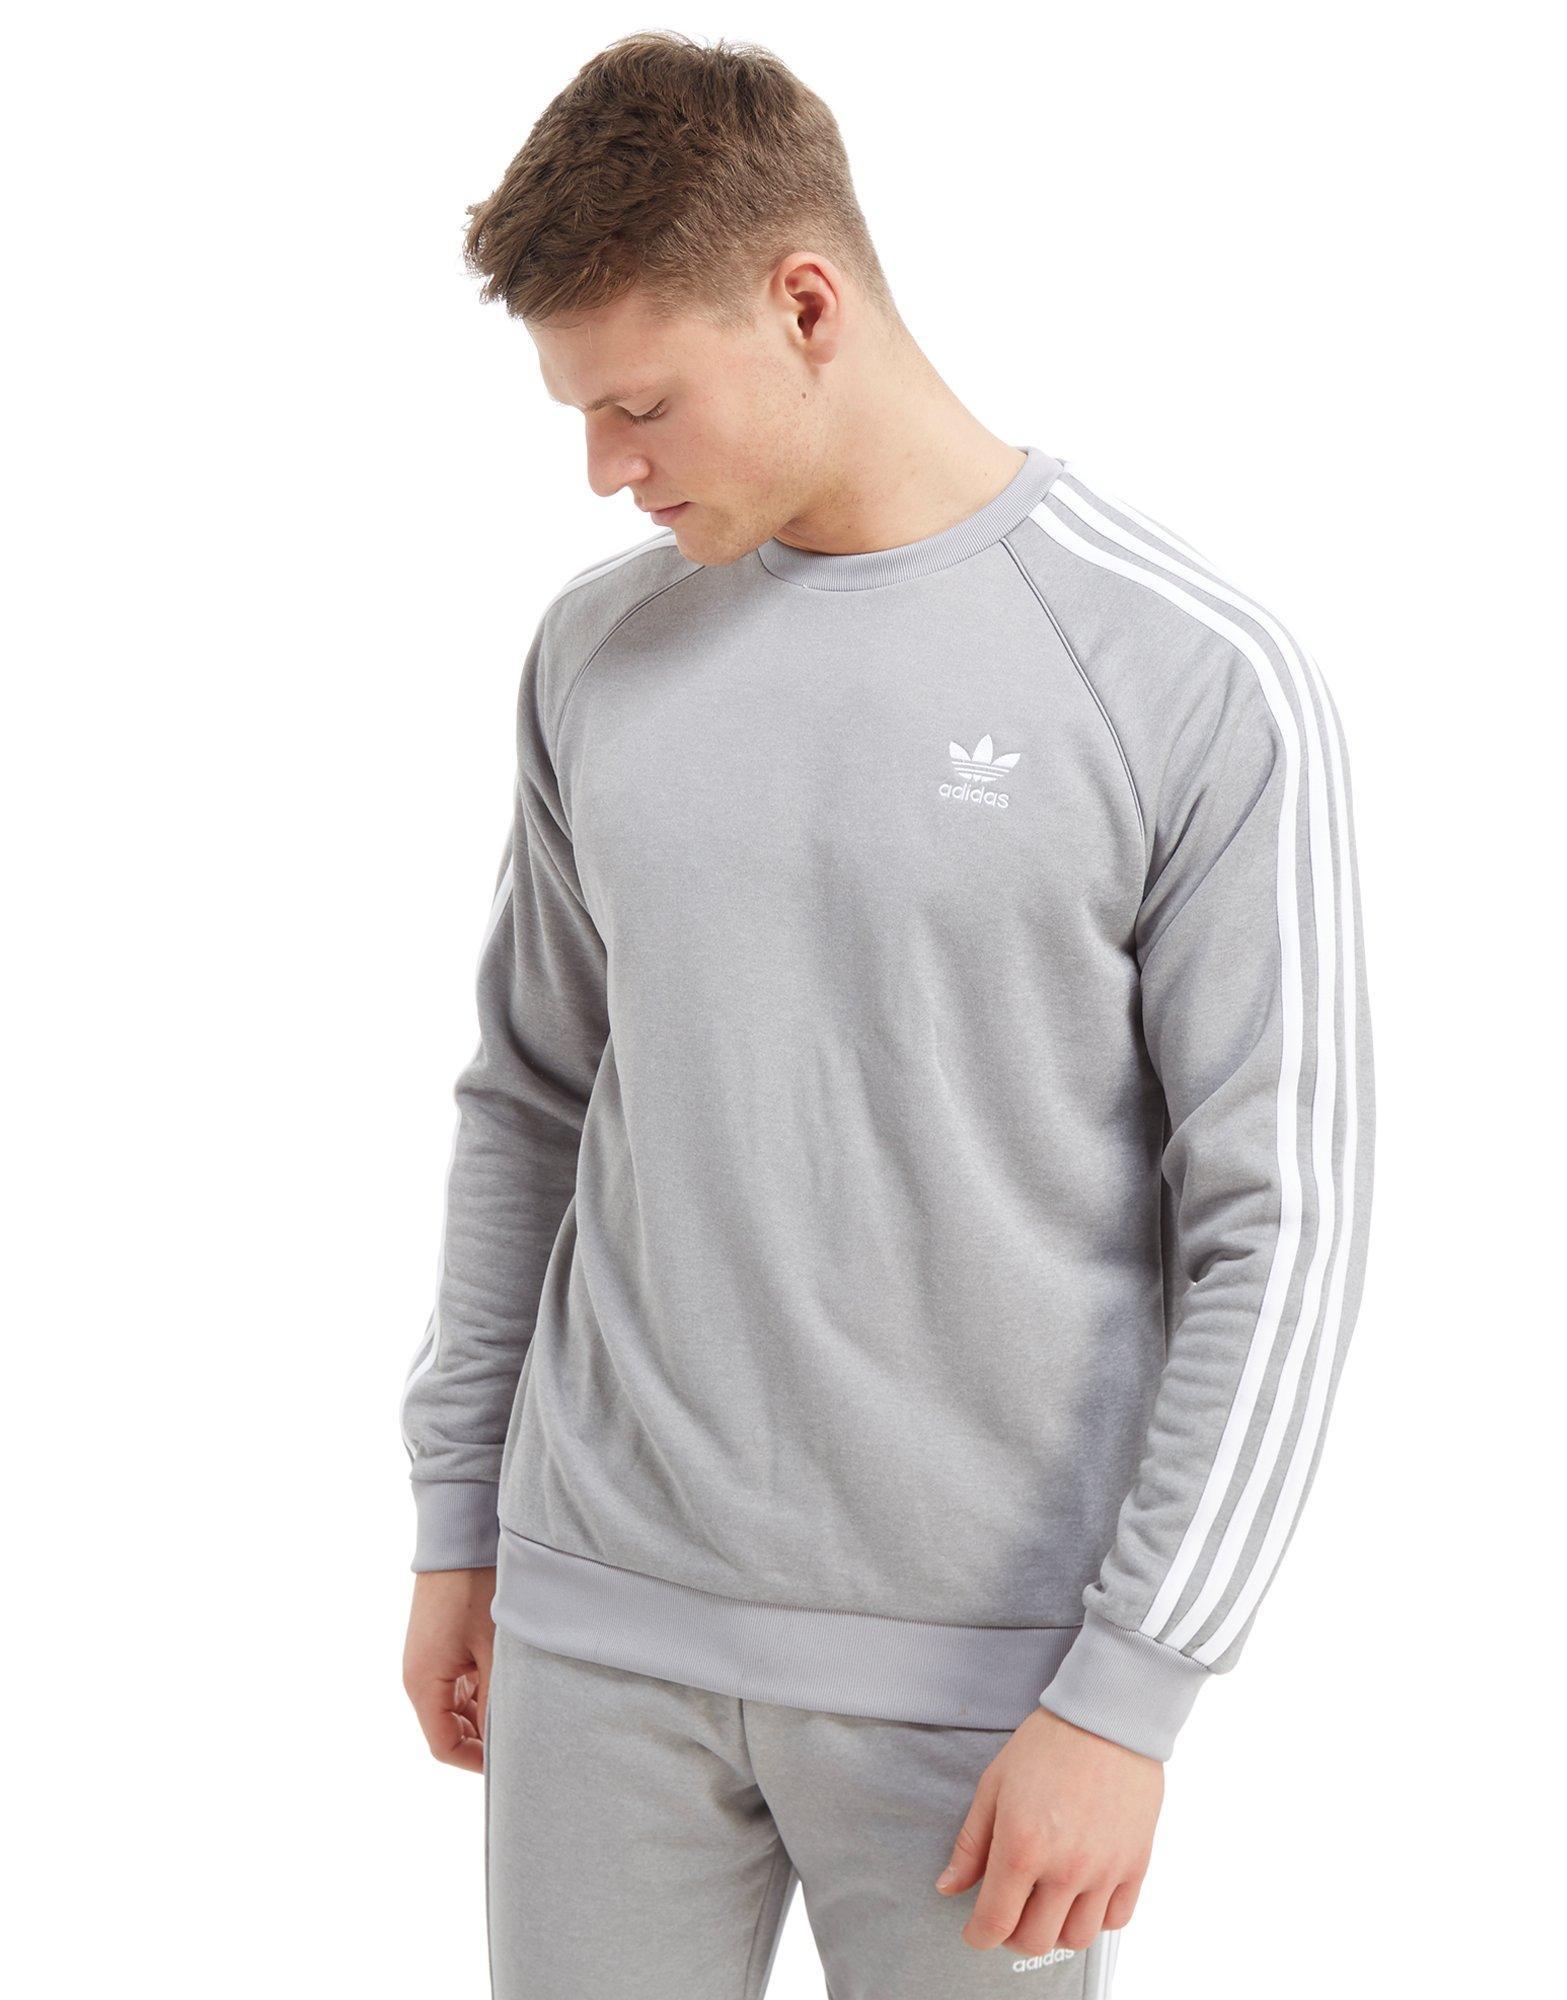 19c91acd38bc Lyst - adidas Originals Superstar Crew Sweatshirt in Gray for Men